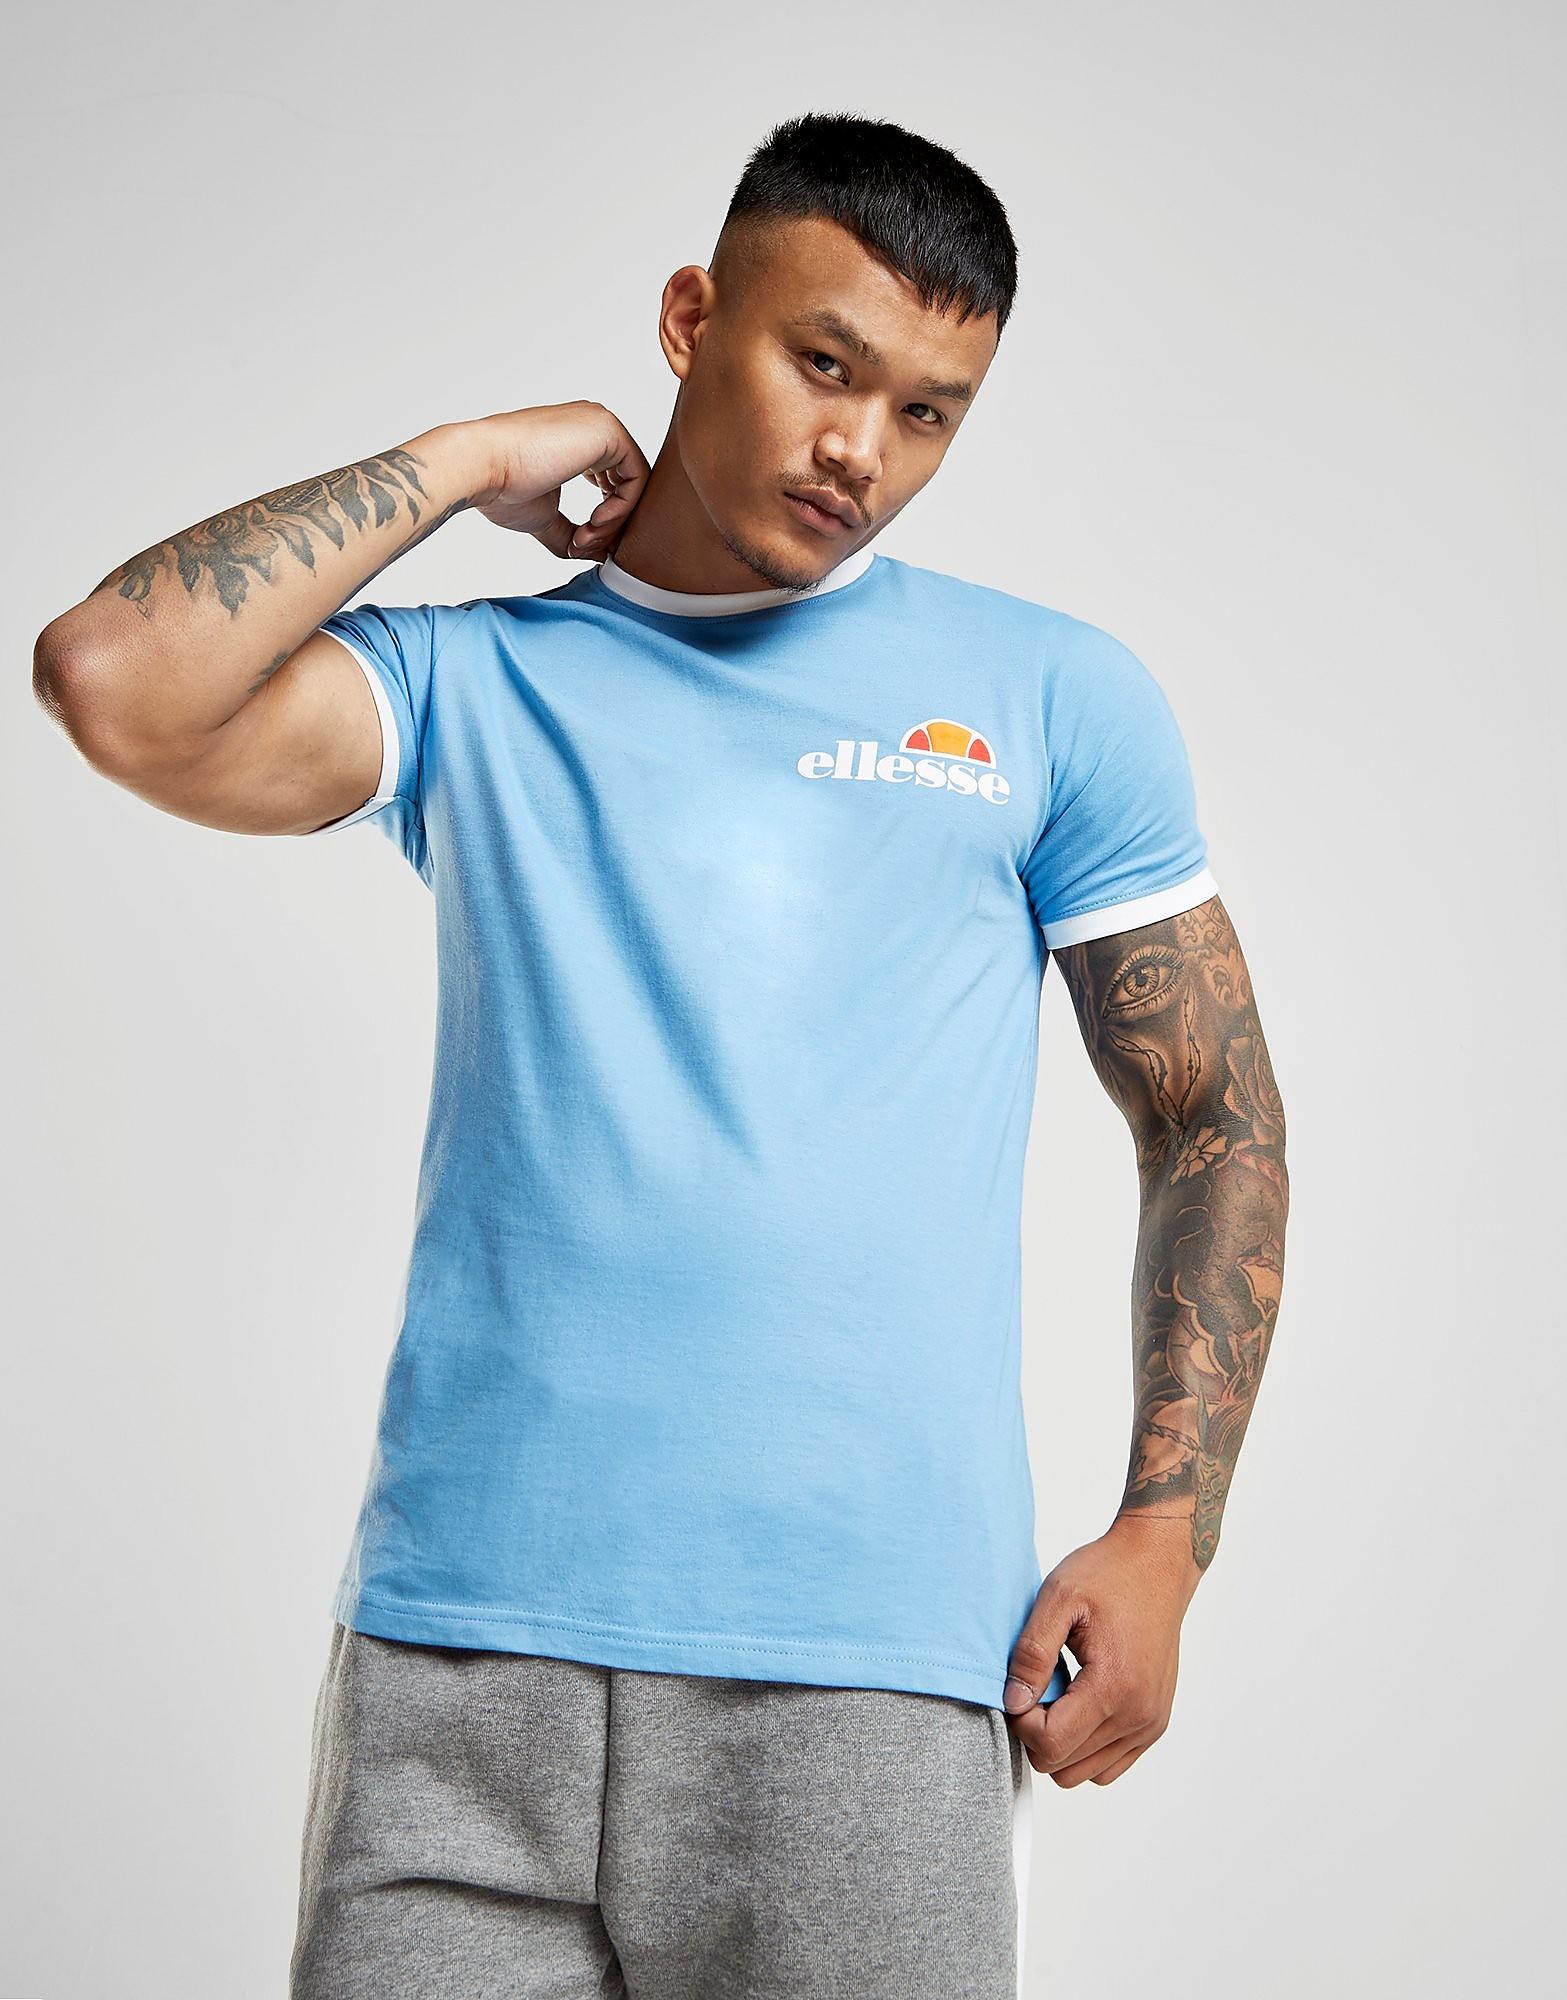 Ellesse Agrigento Ringer T-Shirt